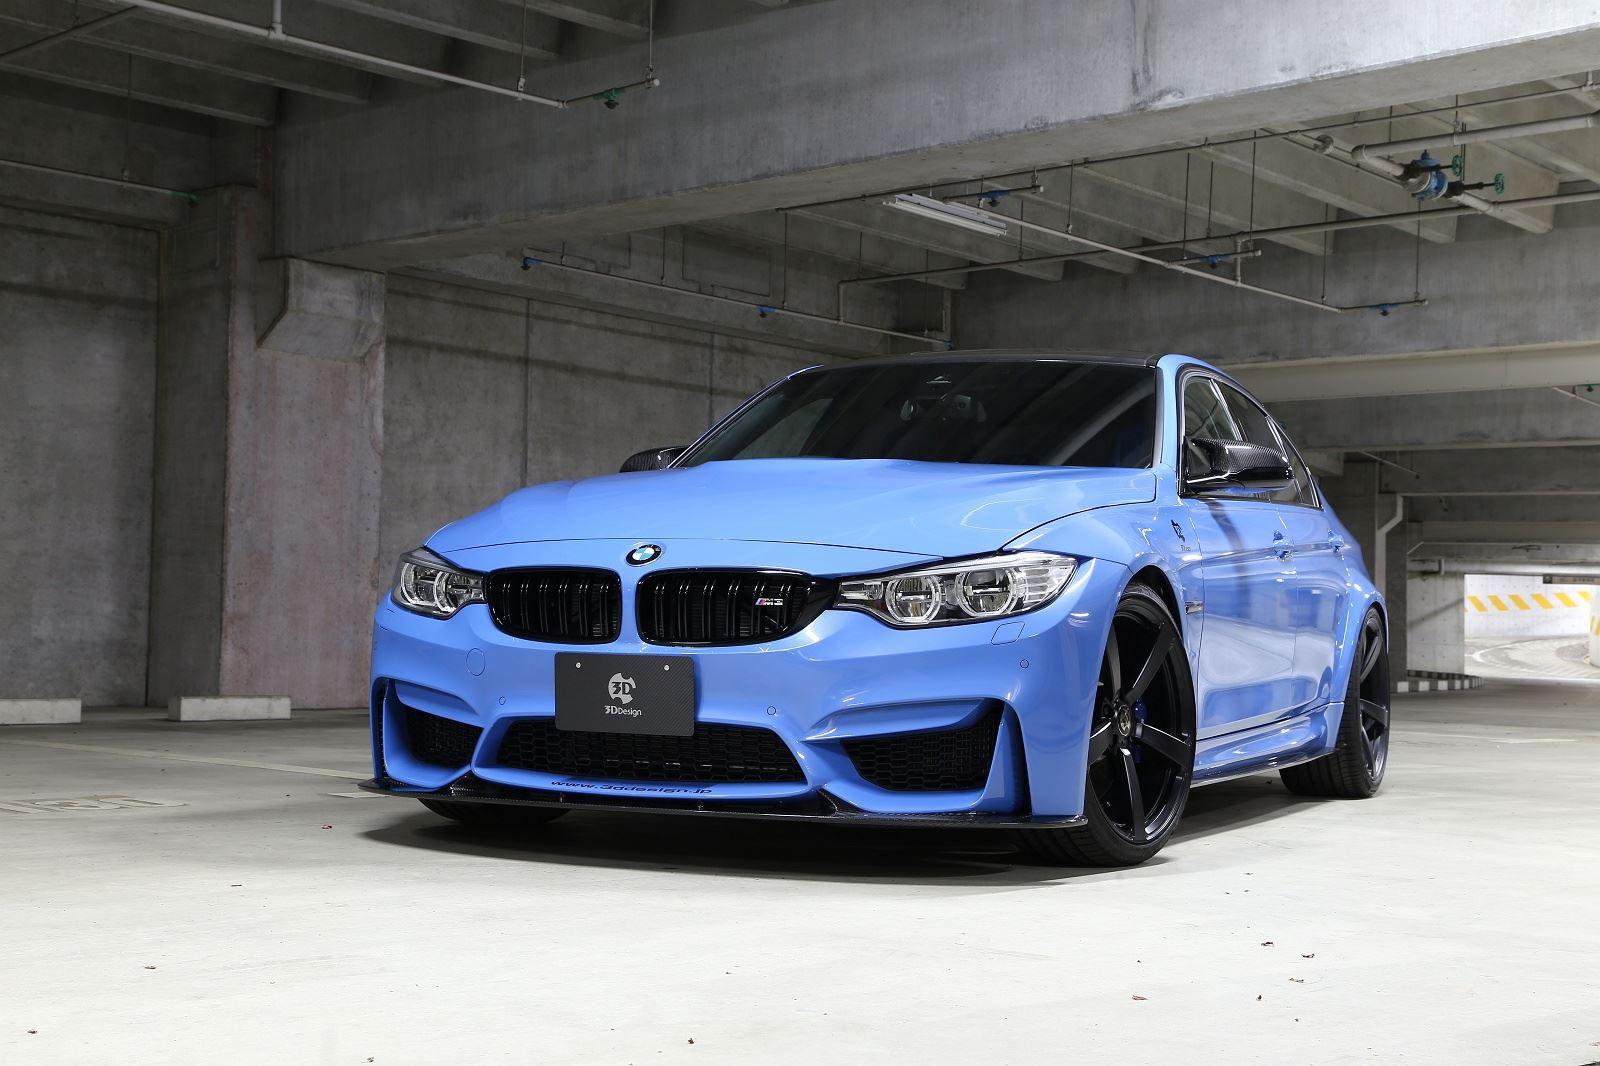 D Design Tweaks Blue BMW F M GTspirit - Blue bmw m3